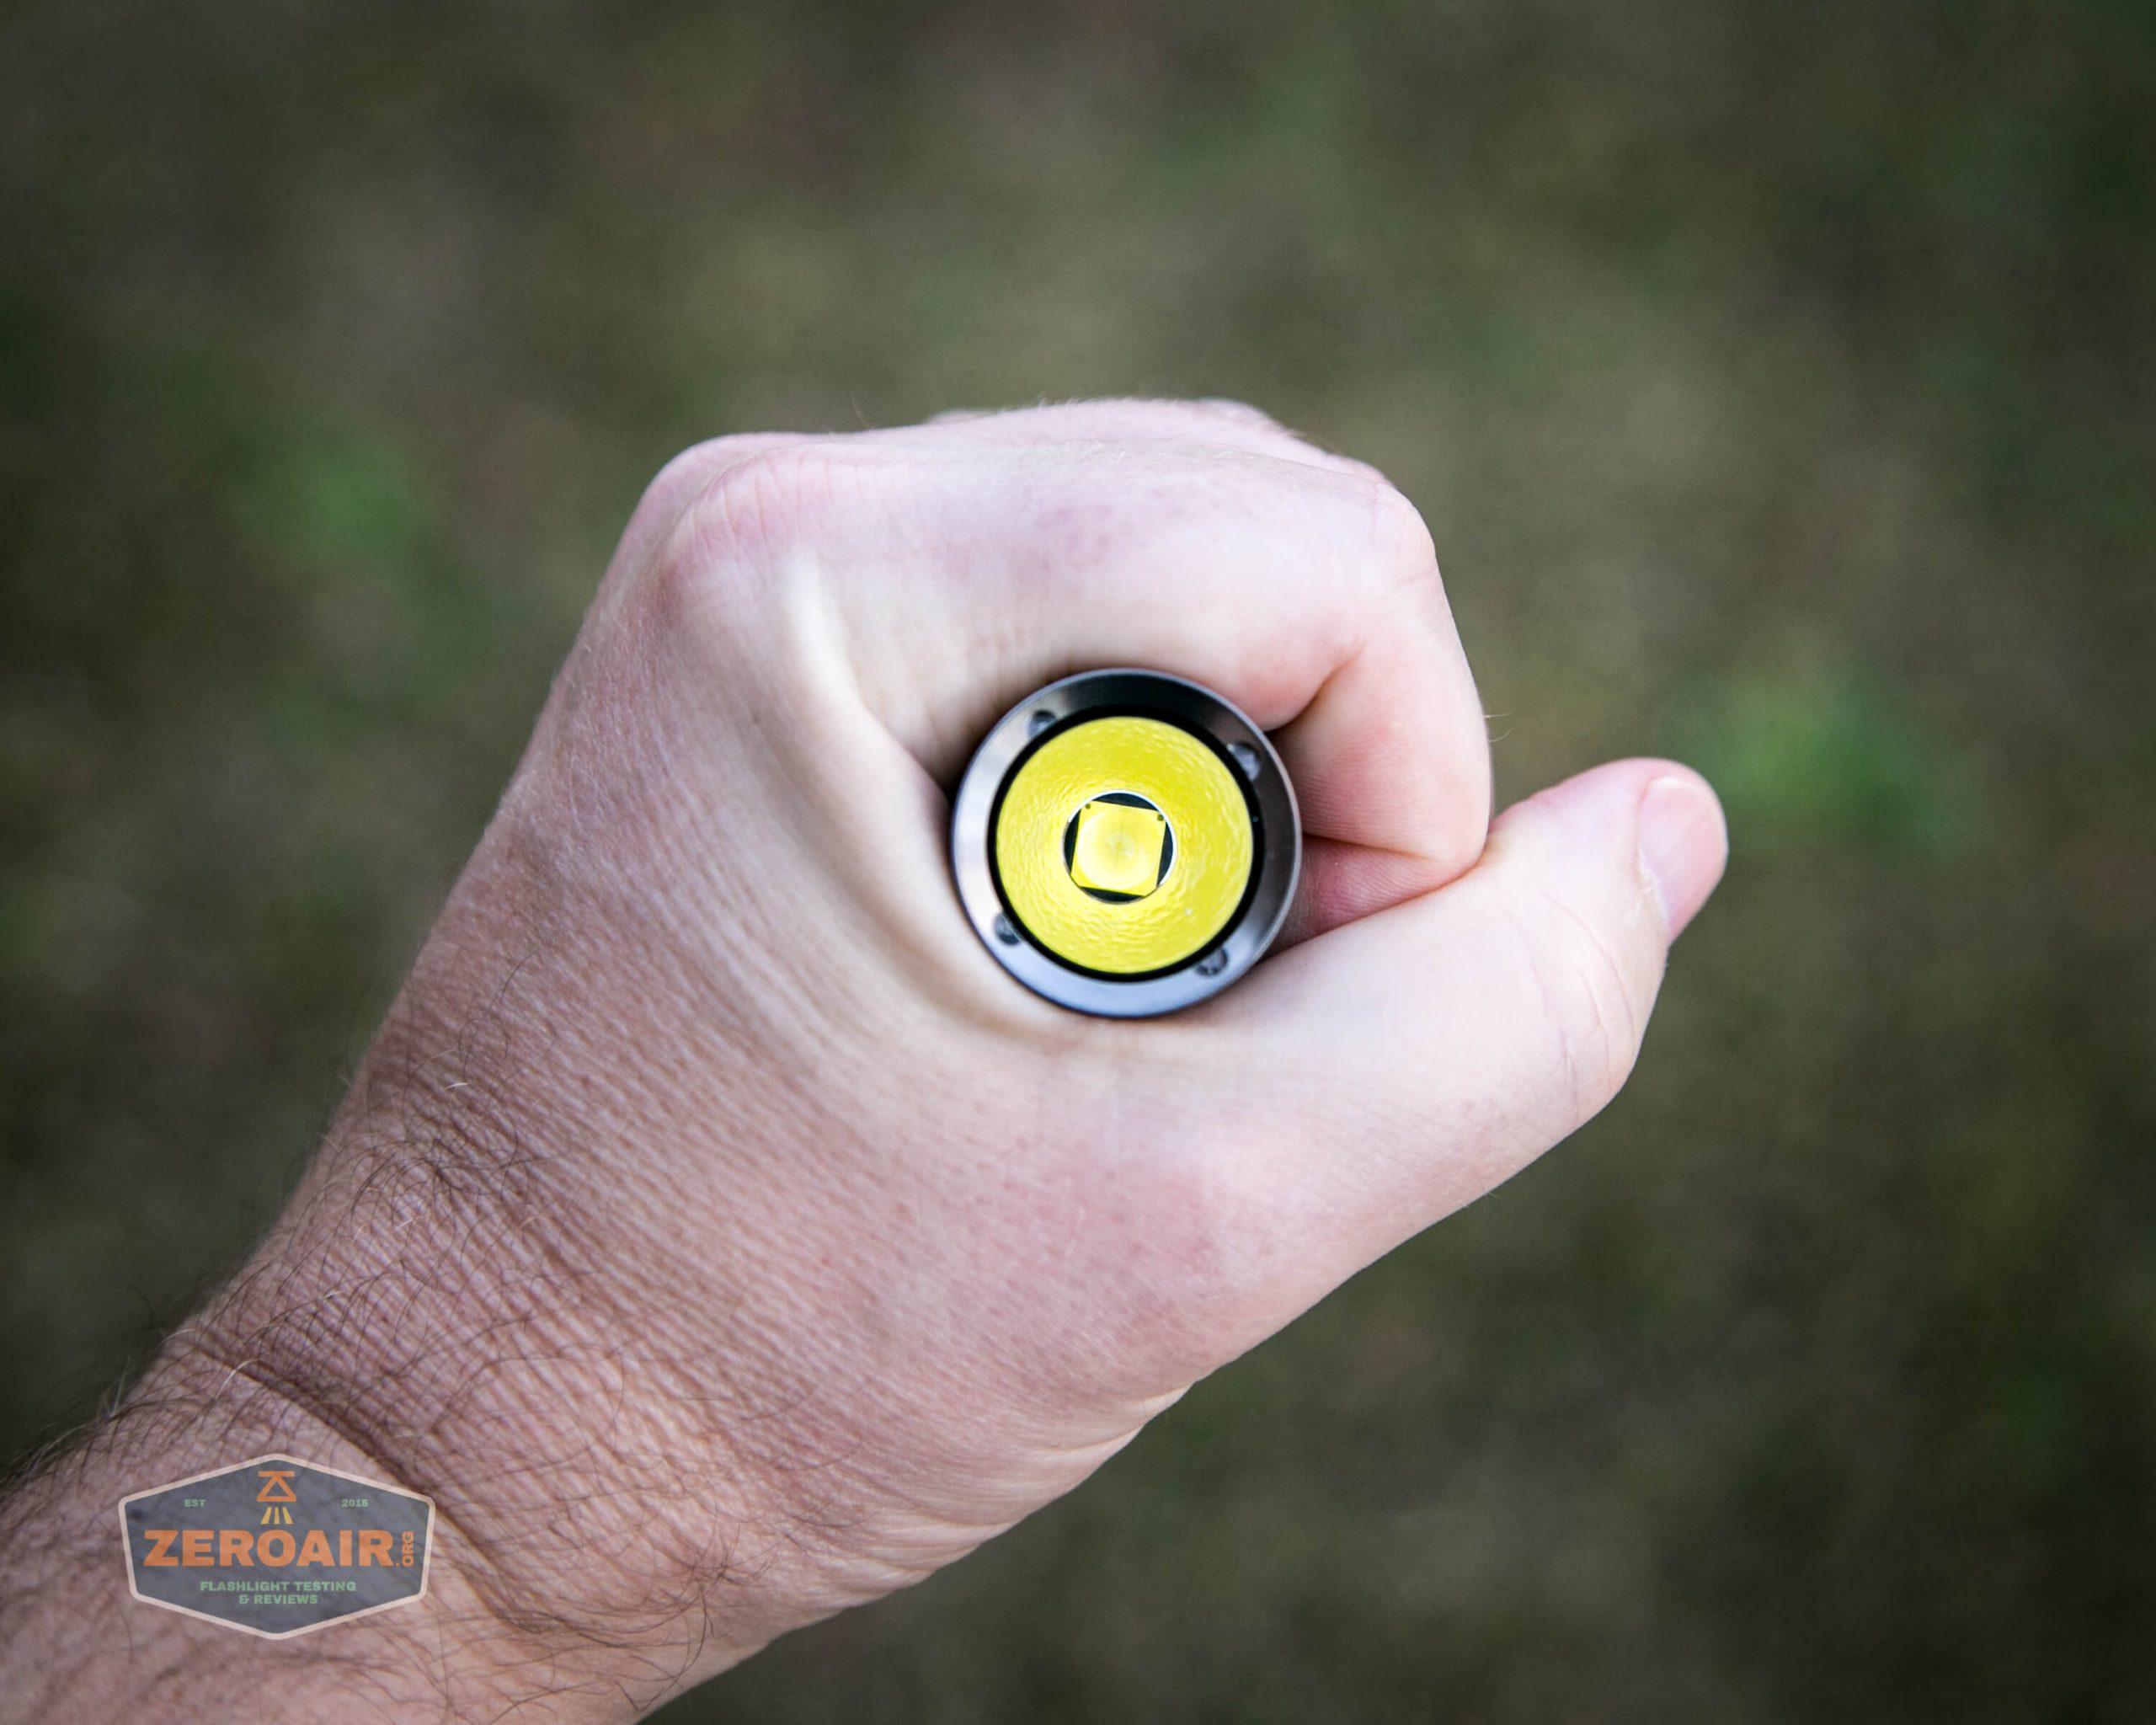 klarus g25 21700 cree xhp70.2 flashlight in hand